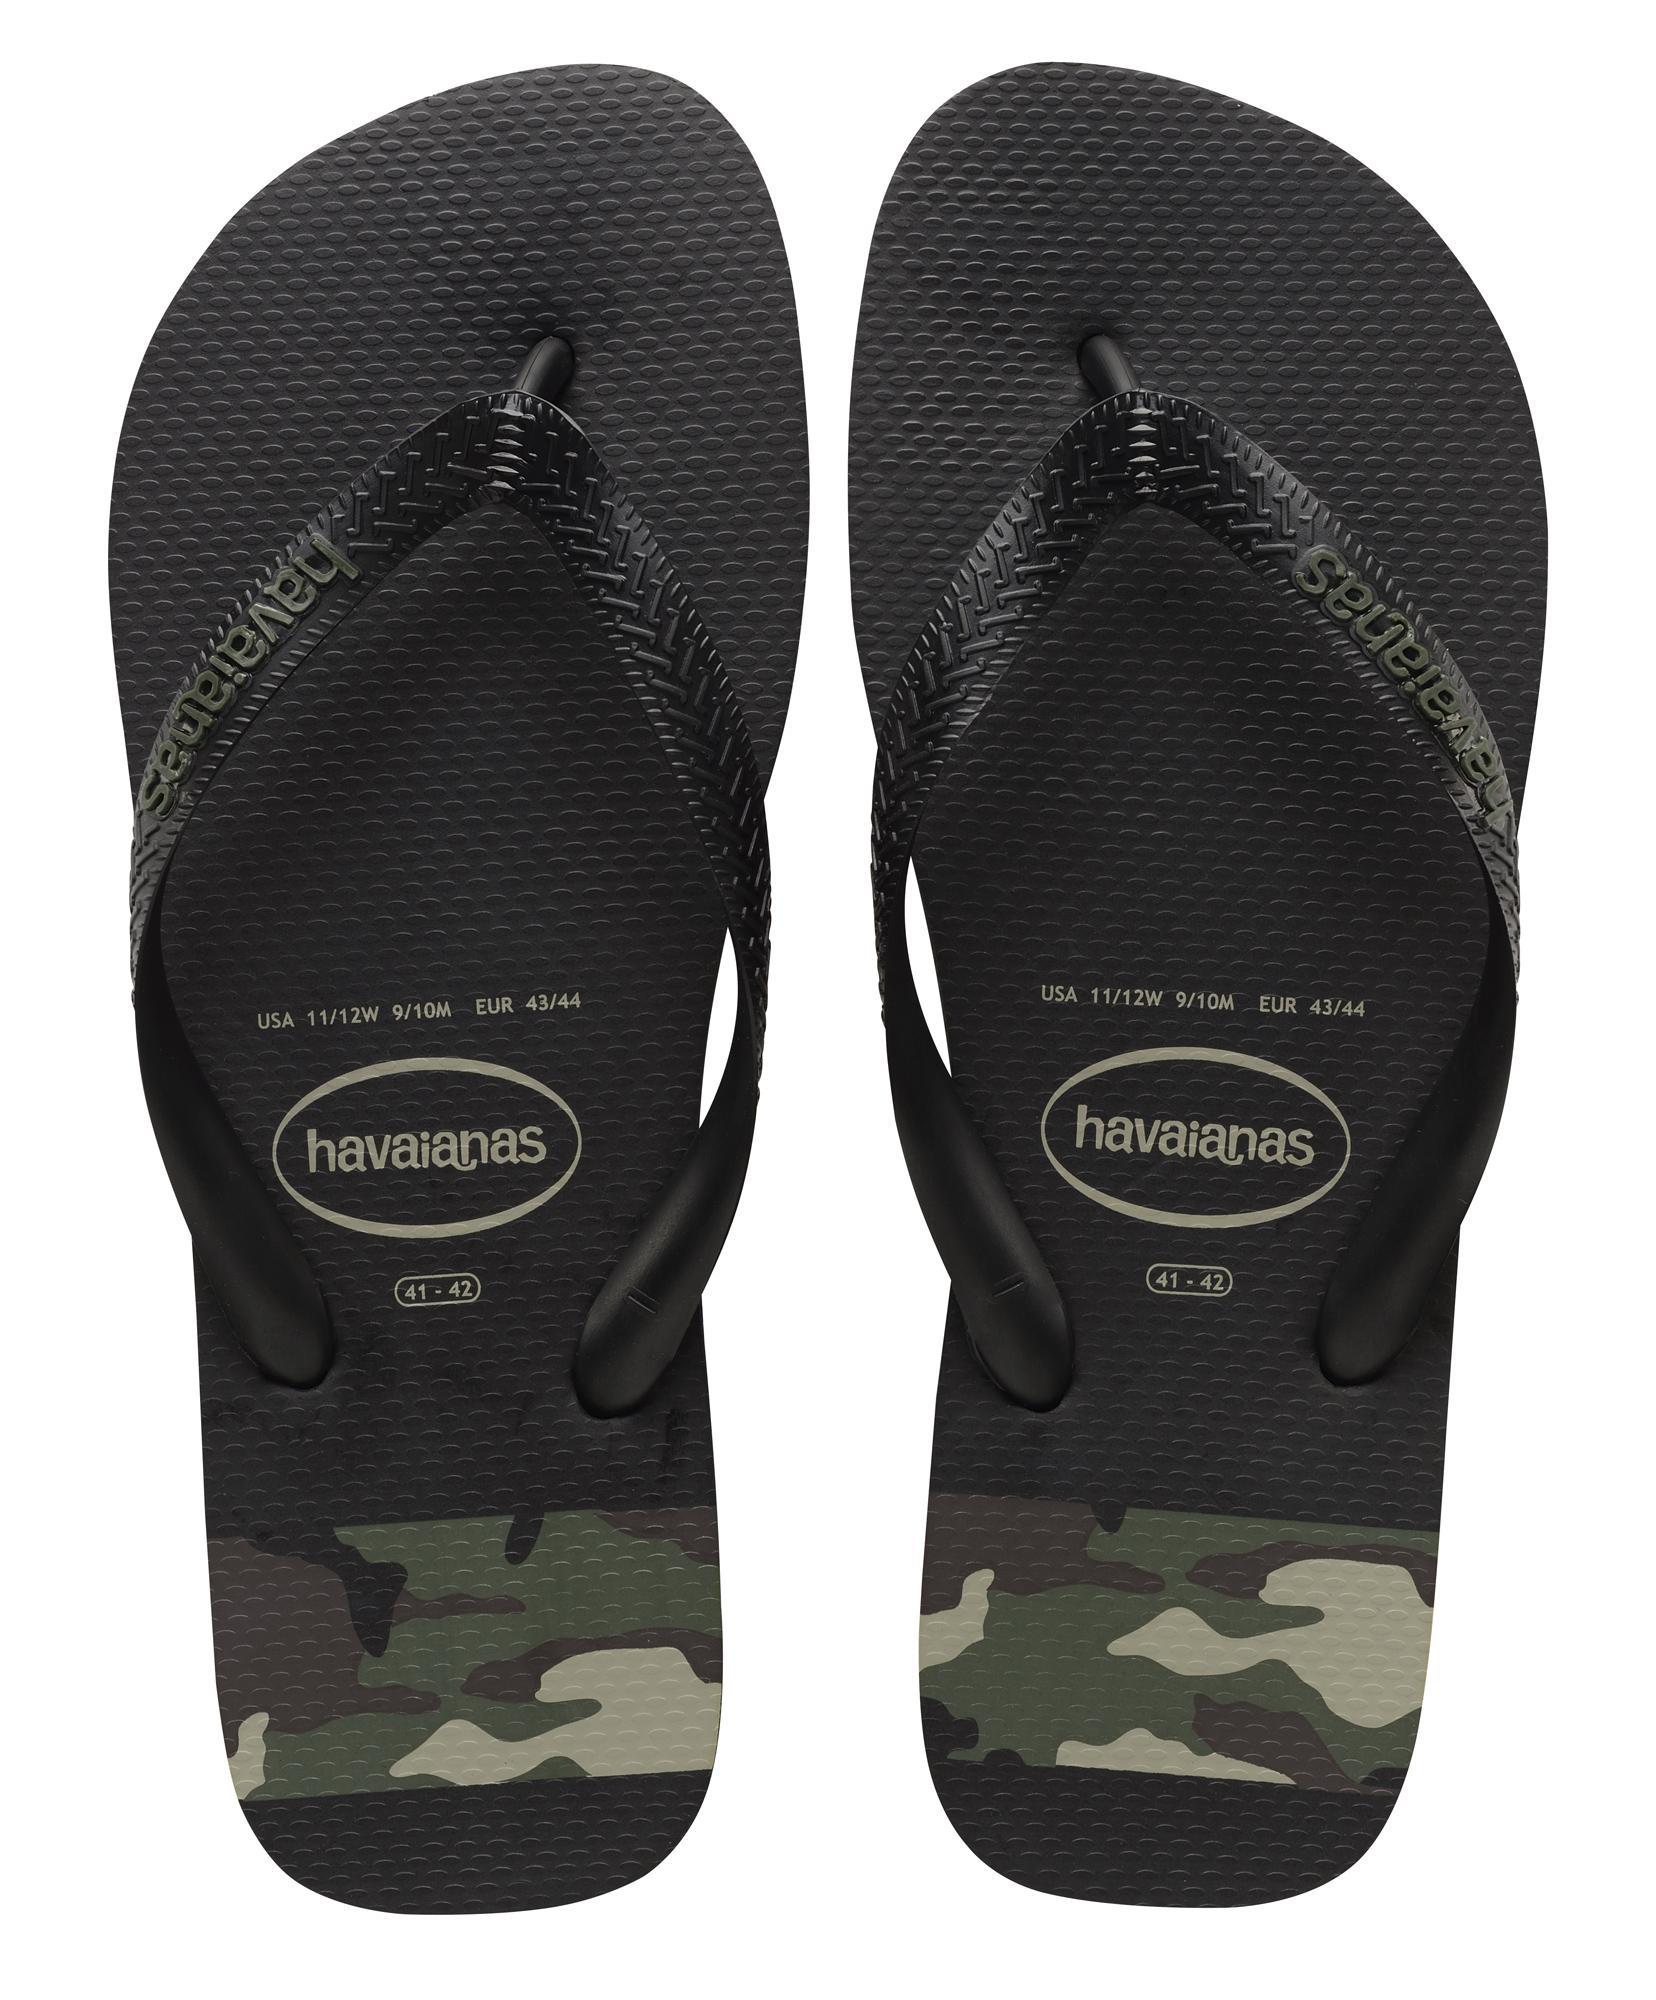 Infradito Havaianas Top Stripes Logo sandali uomo nero/verde camouflage camouflage nero/verde 41325850 e89928